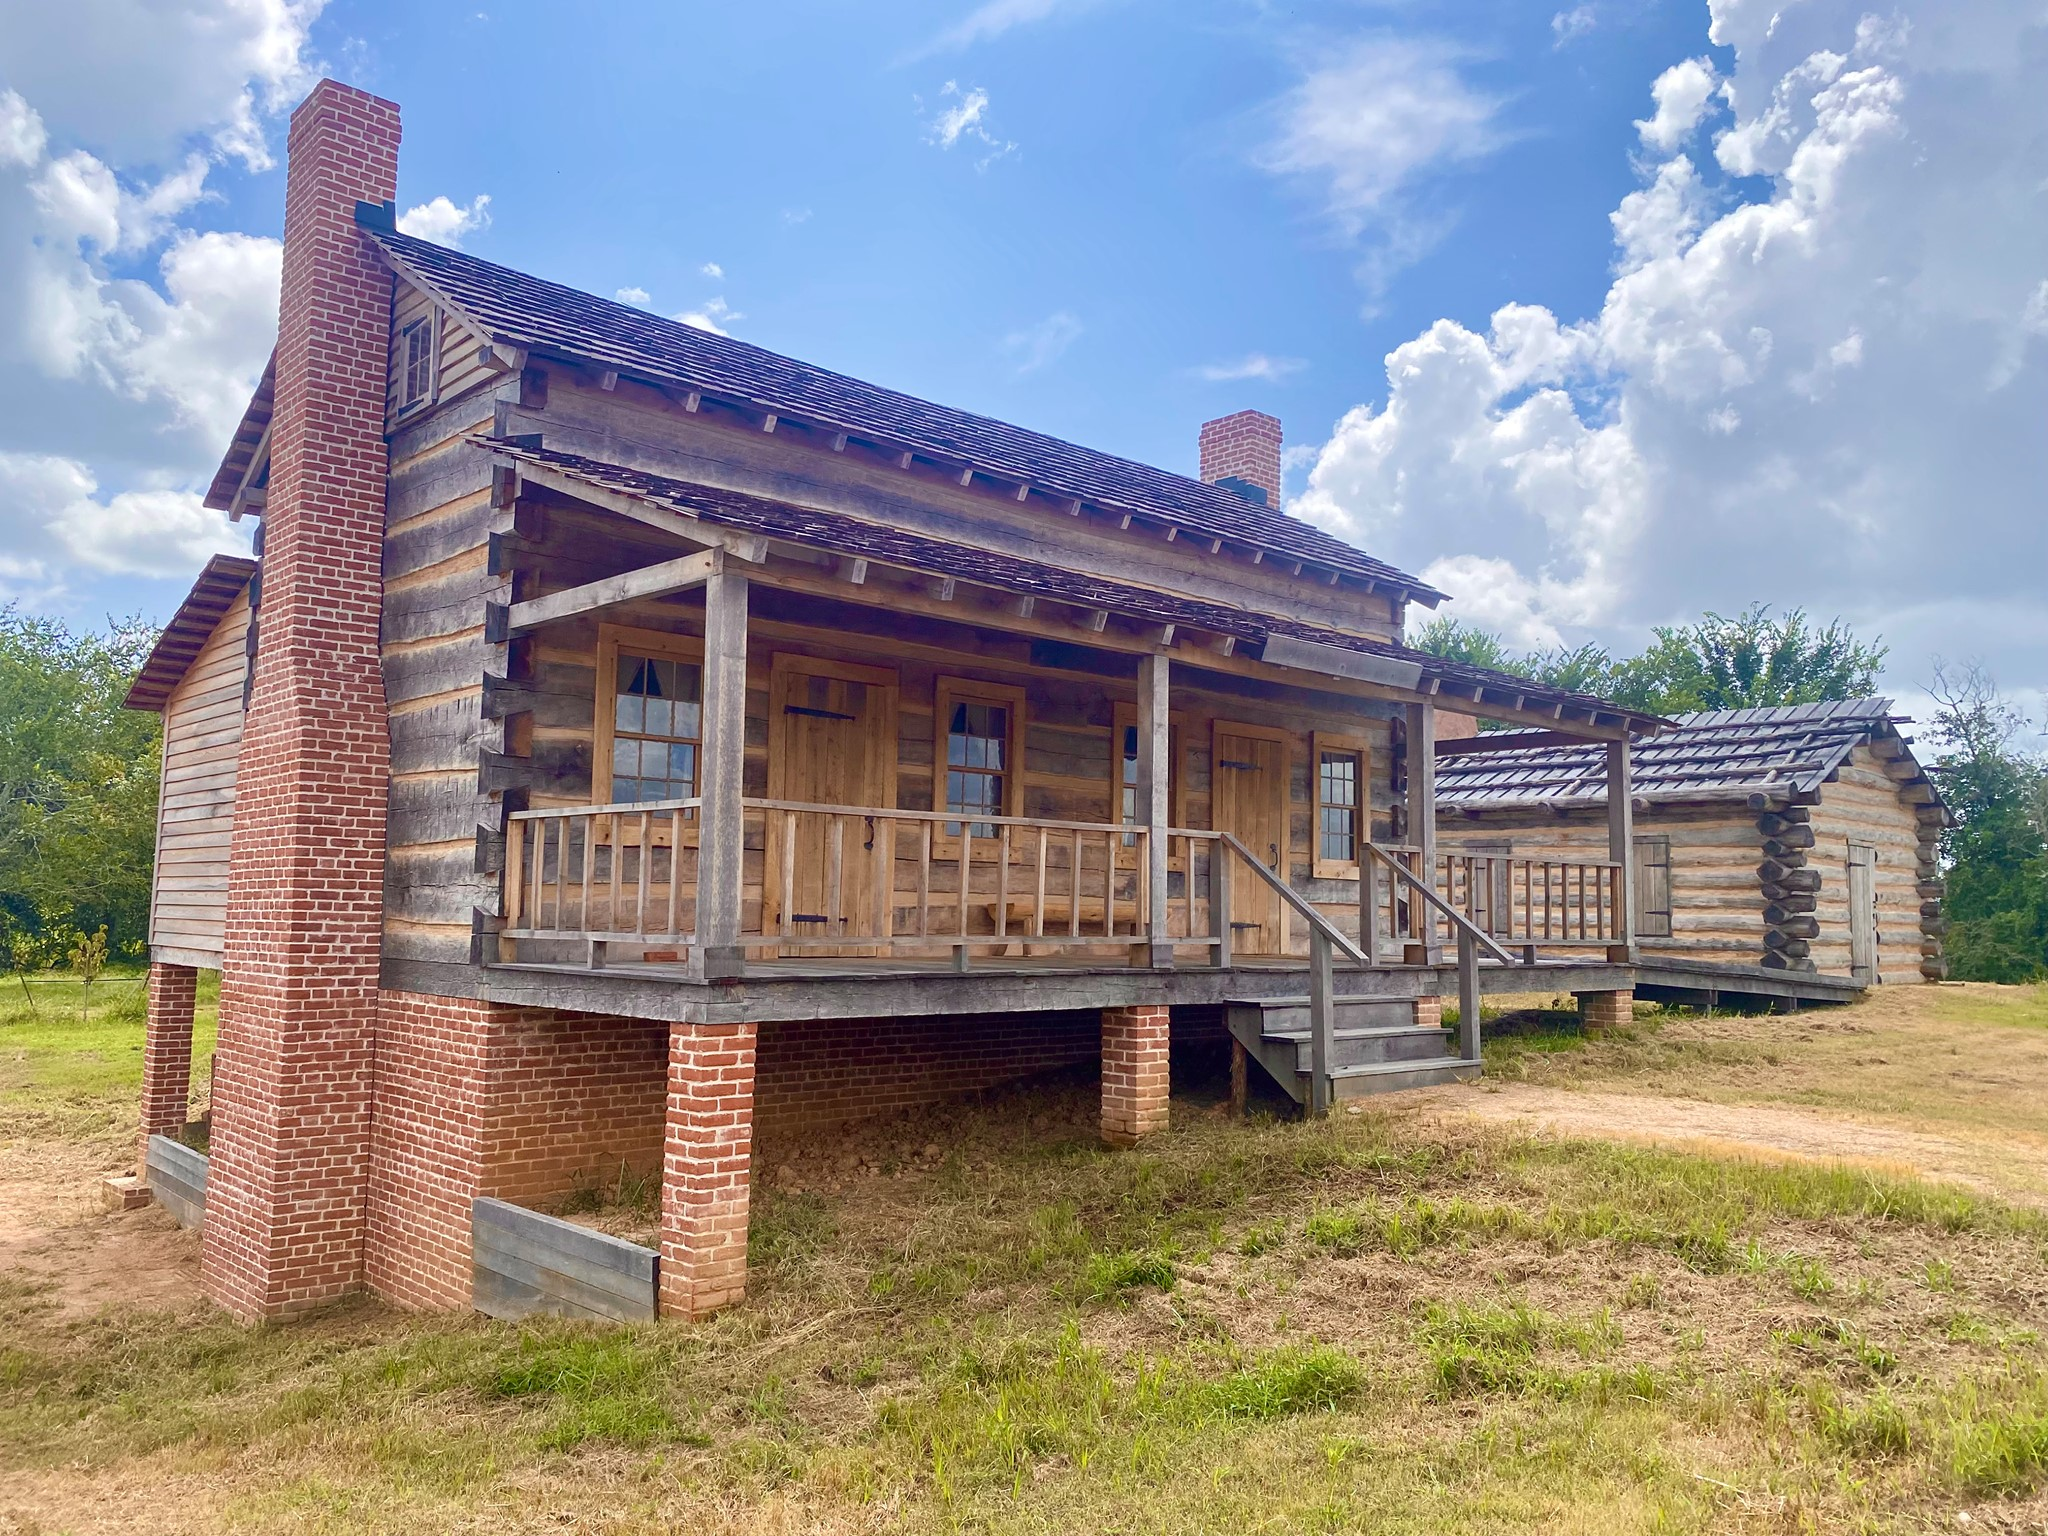 San Felipe De Austin State Historic Site Prepares To Open New Outdoor Exhibit:  Villa de Austin